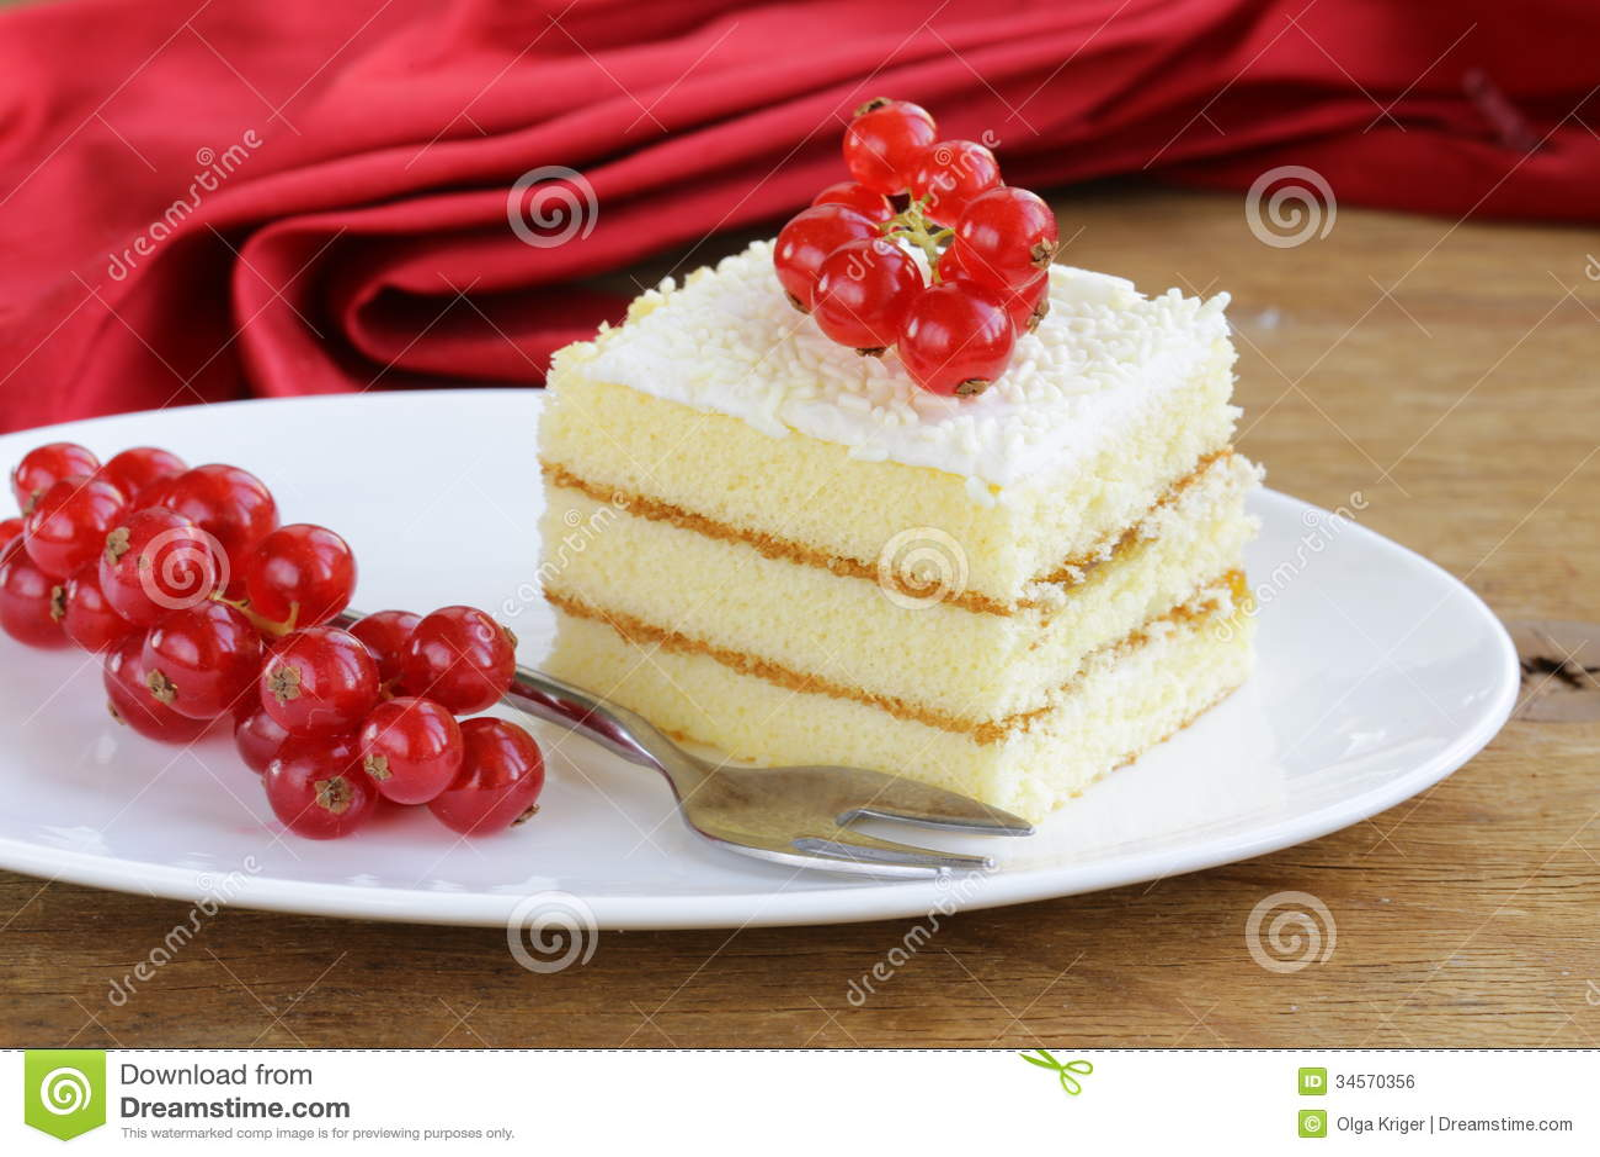 Sponge Cake D Ef Bf Bdcor Ef Bf Bd